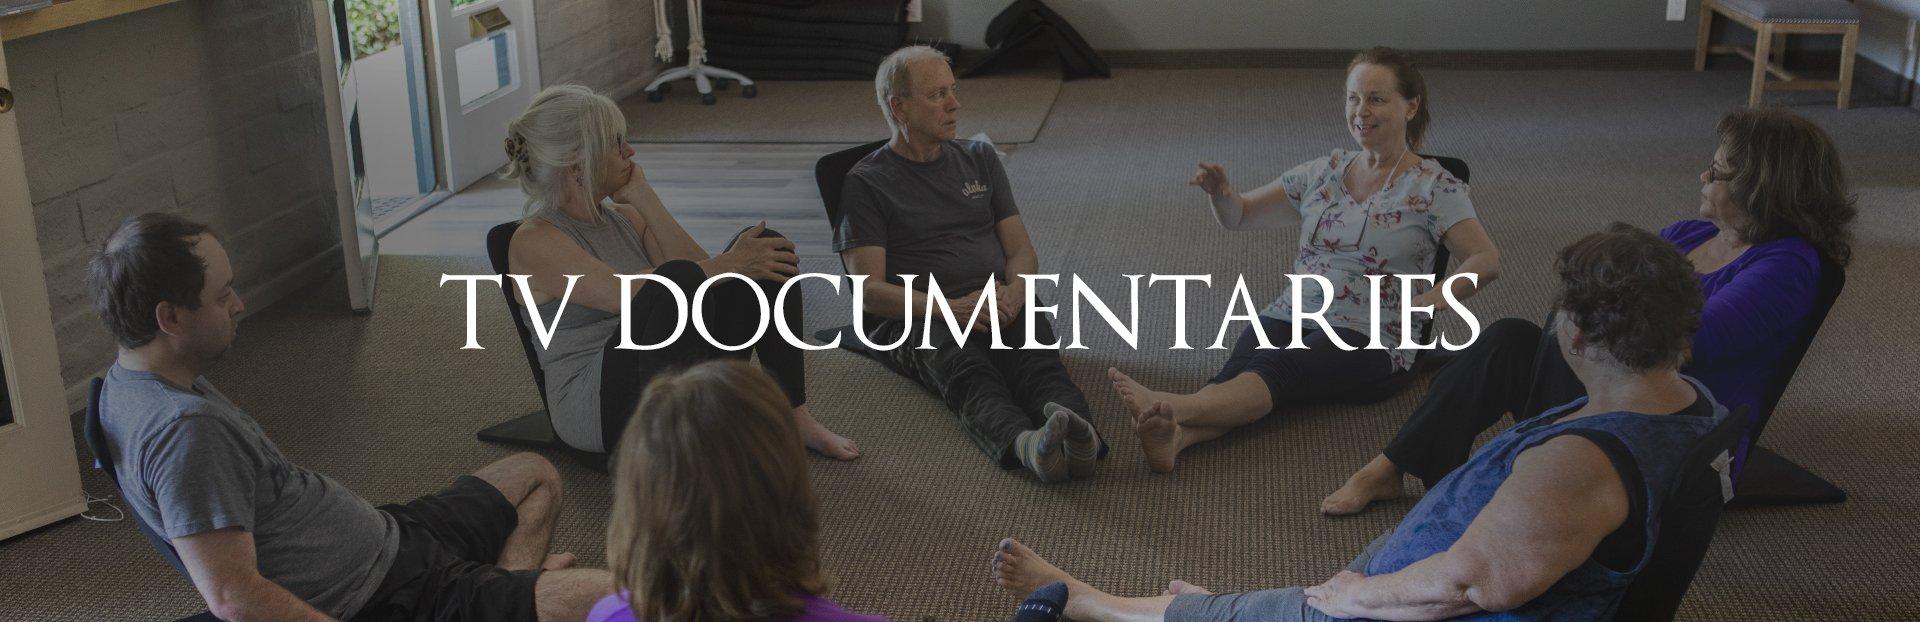 TV Documentaries